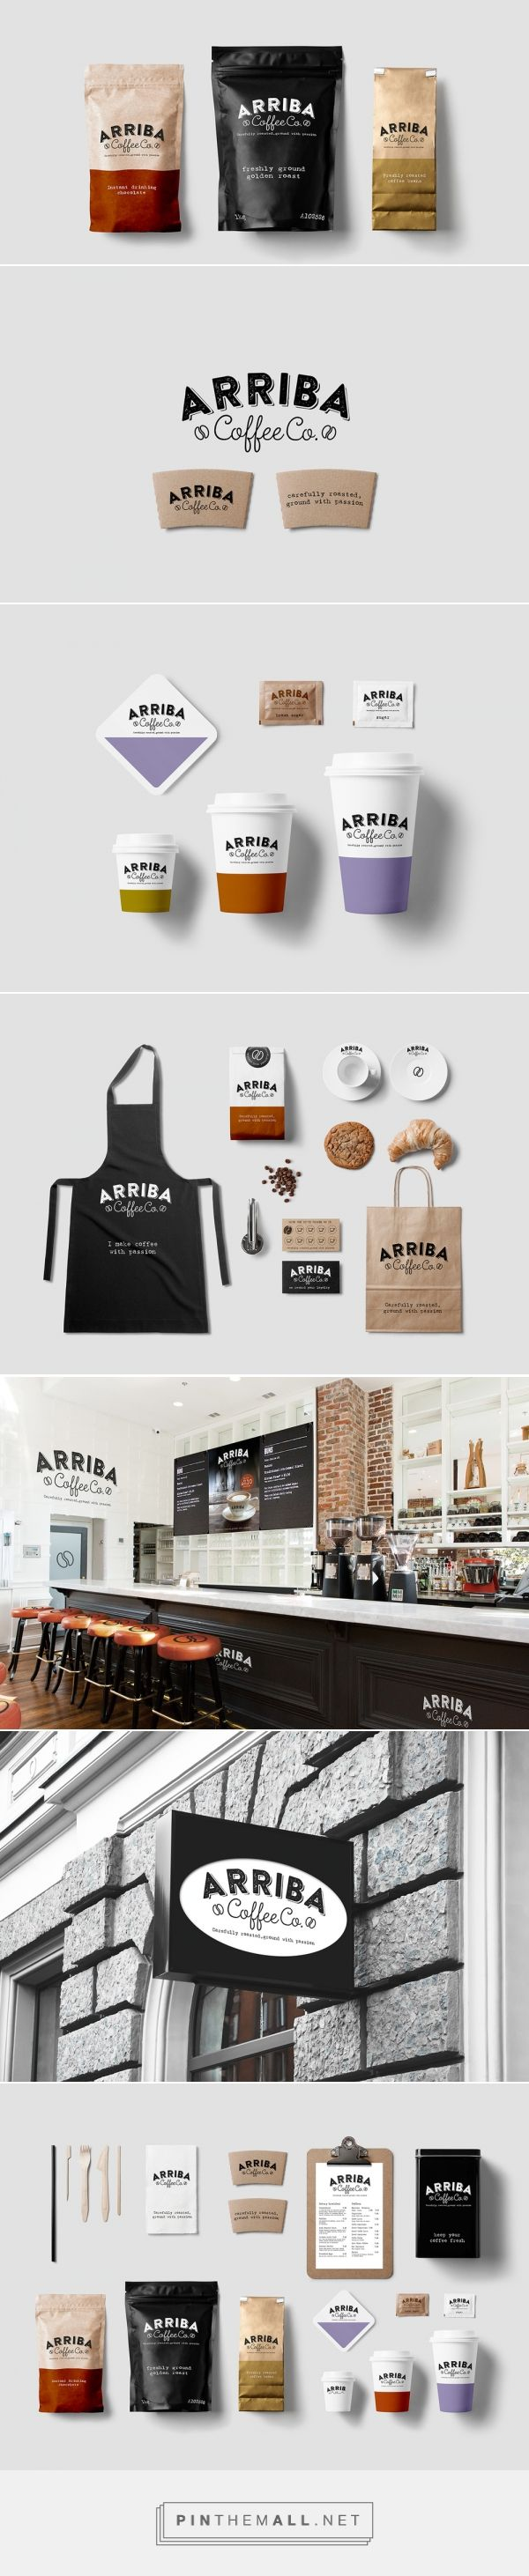 Arriba Coffee Co - created via http://pinthemall.net